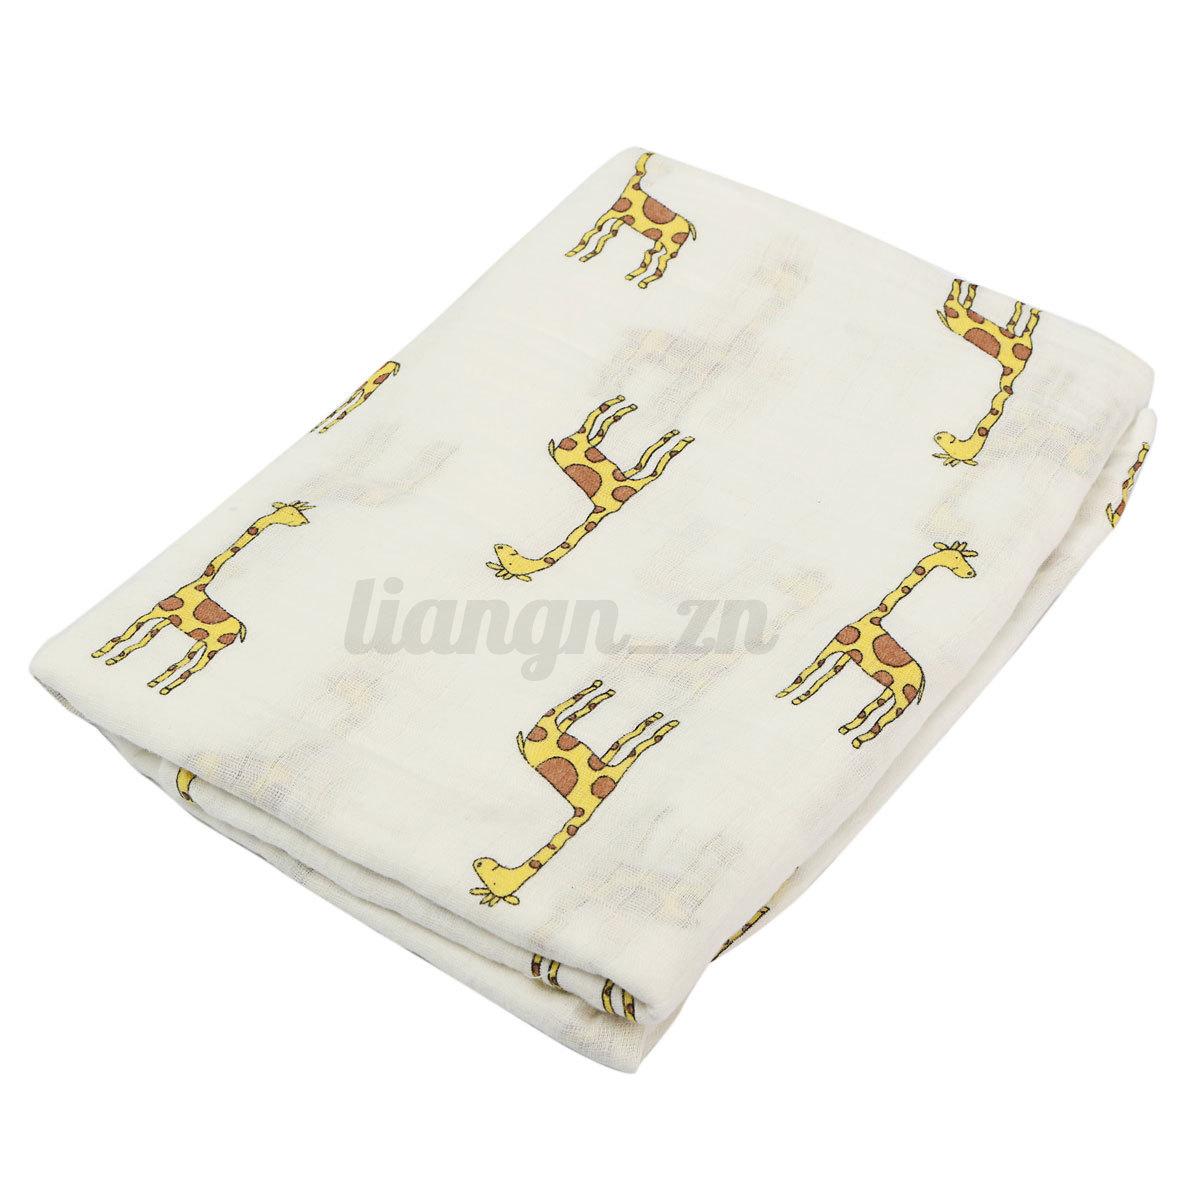 couverture nouveau n b b couchage gigoteuse emmailloter serviette blanket ebay. Black Bedroom Furniture Sets. Home Design Ideas